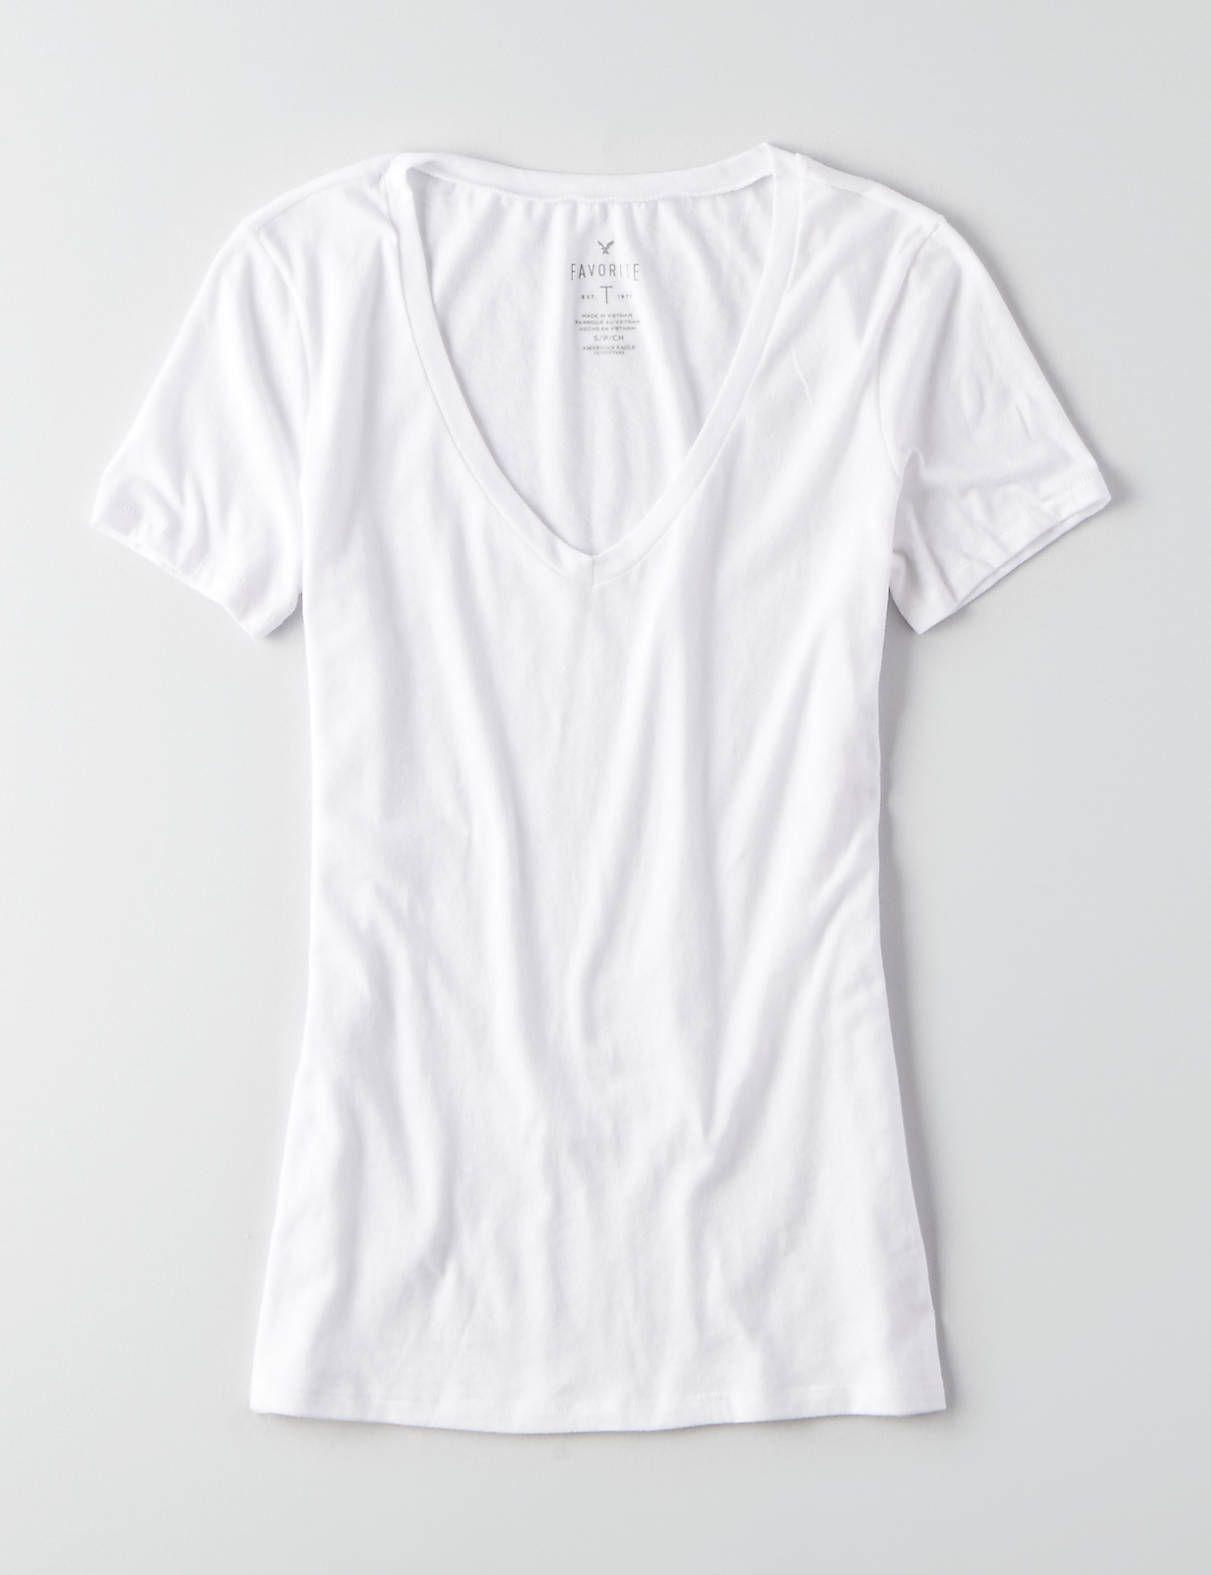 AEO Soft & Sexy V-Neck Favorite T-Shirt | Aeo, American eagle ...